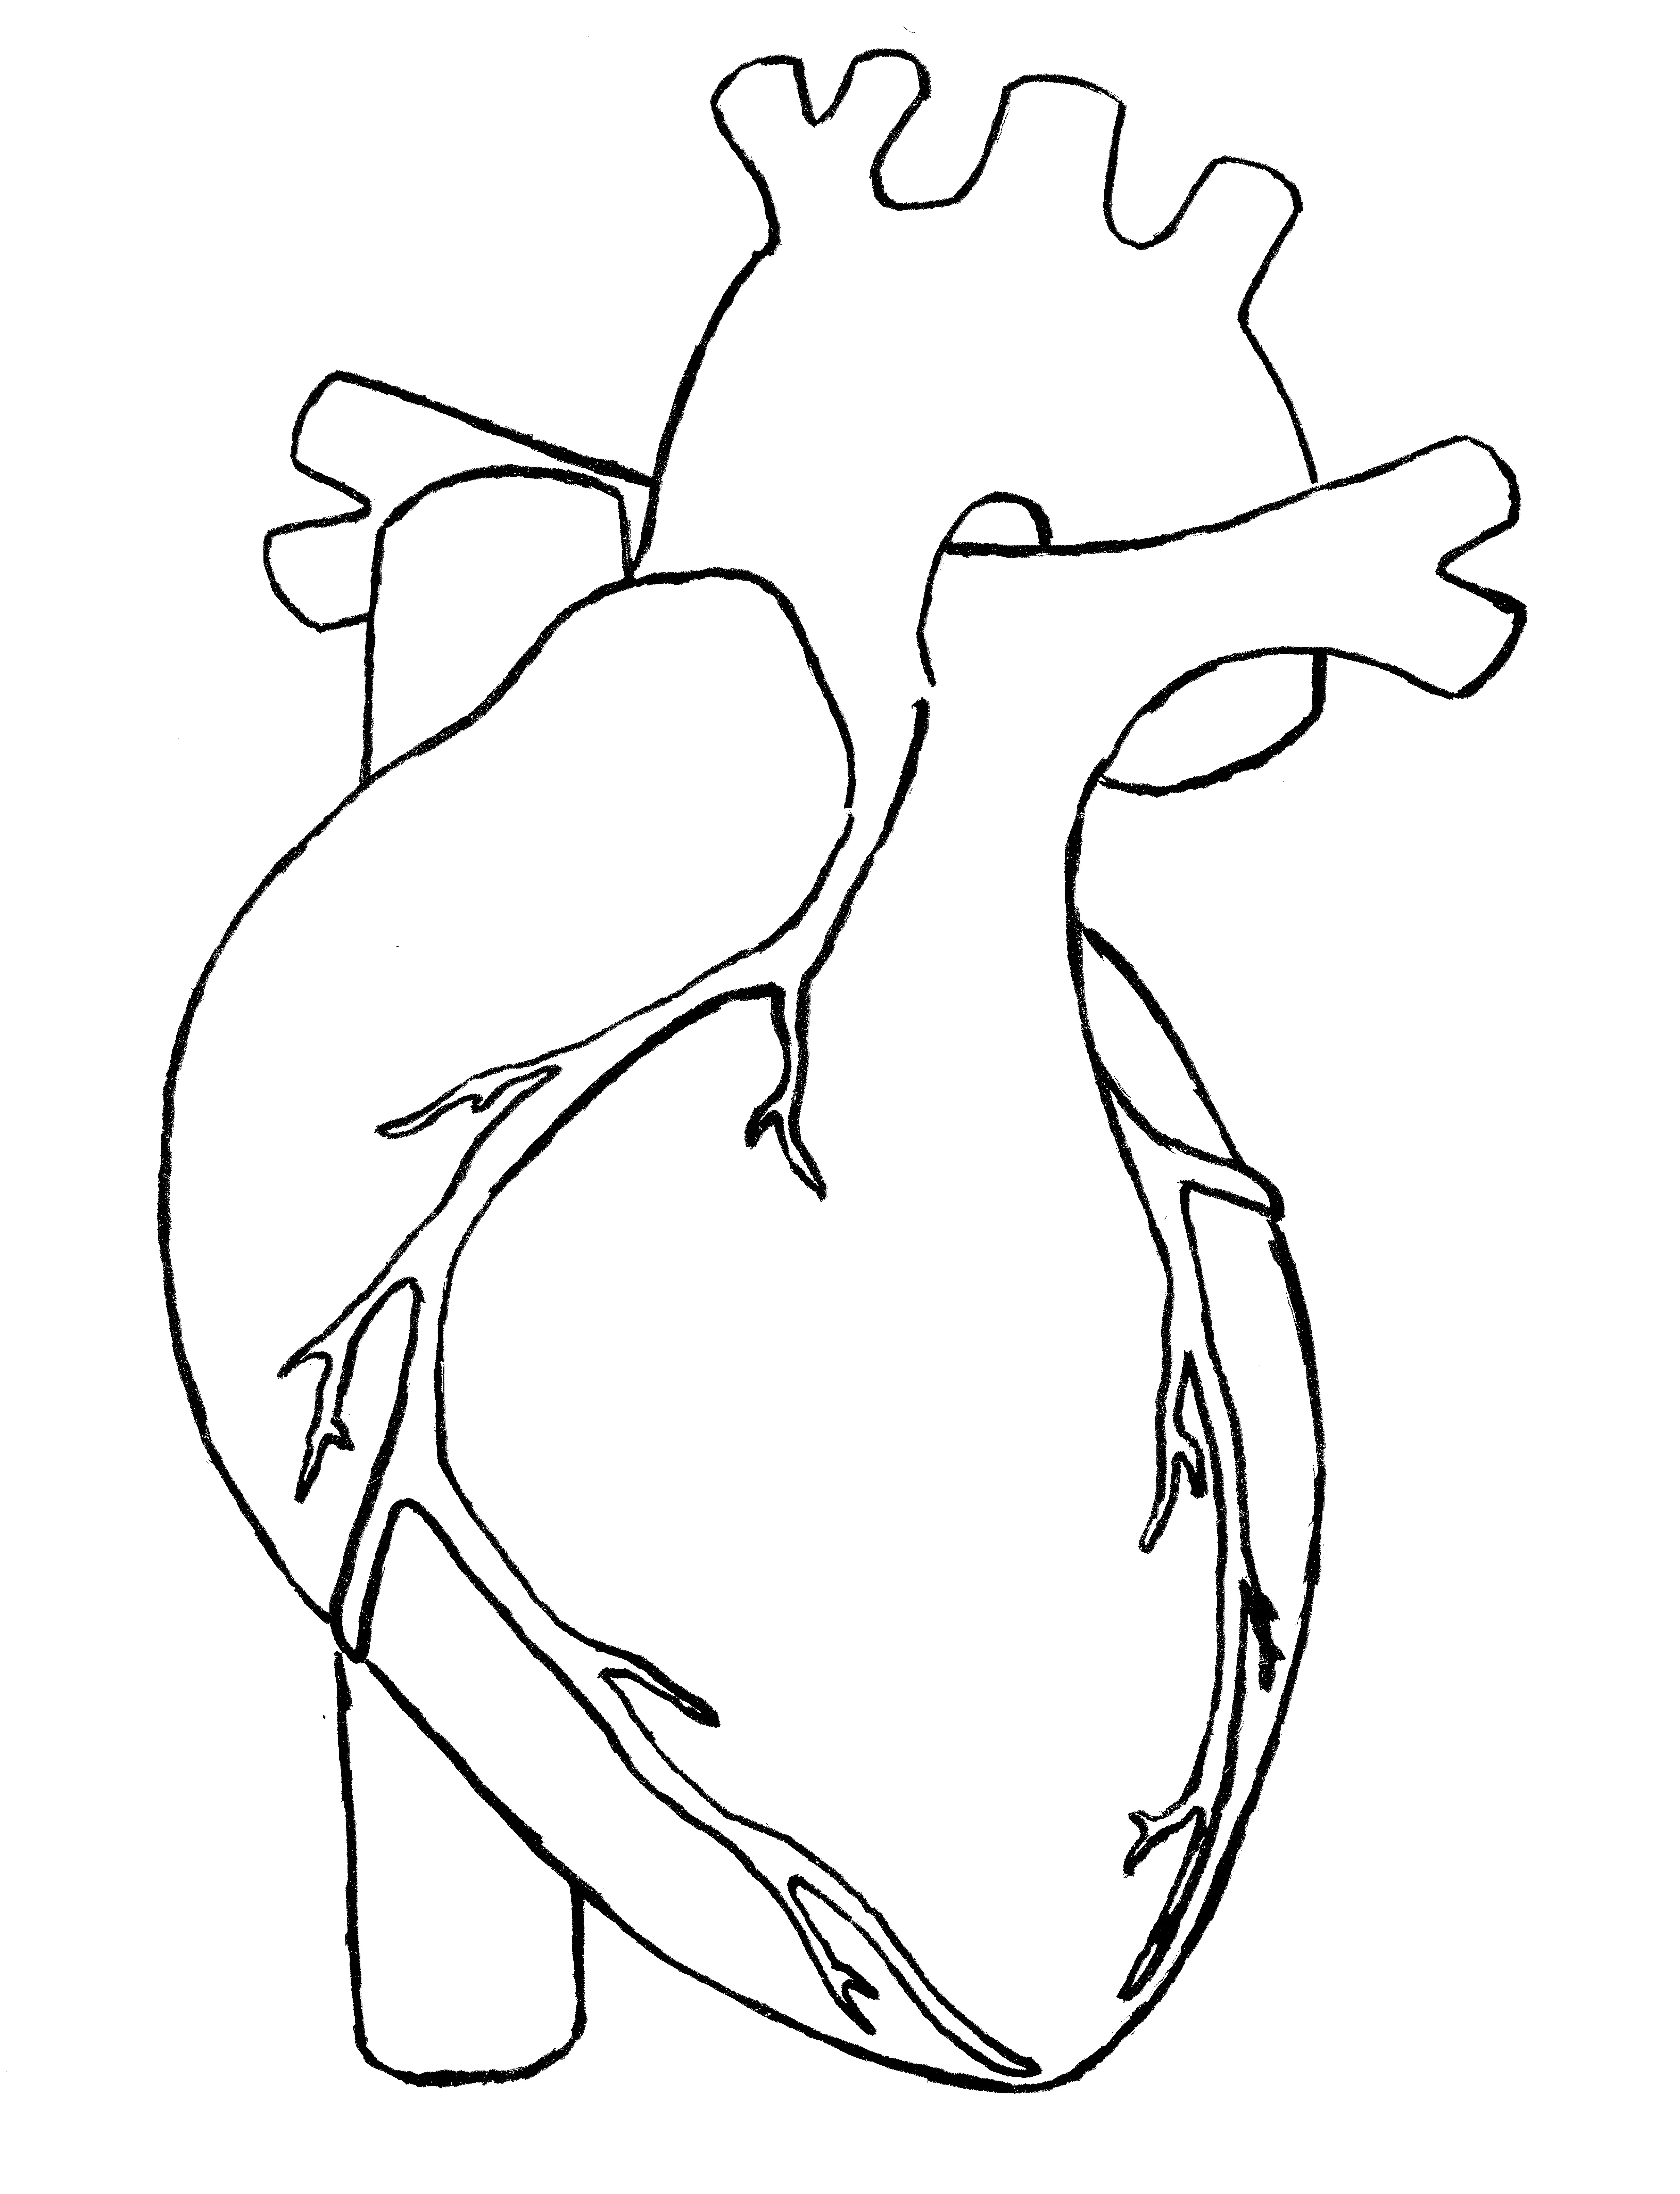 Organs clipart actual heart Human Anatomy Human Black #1700